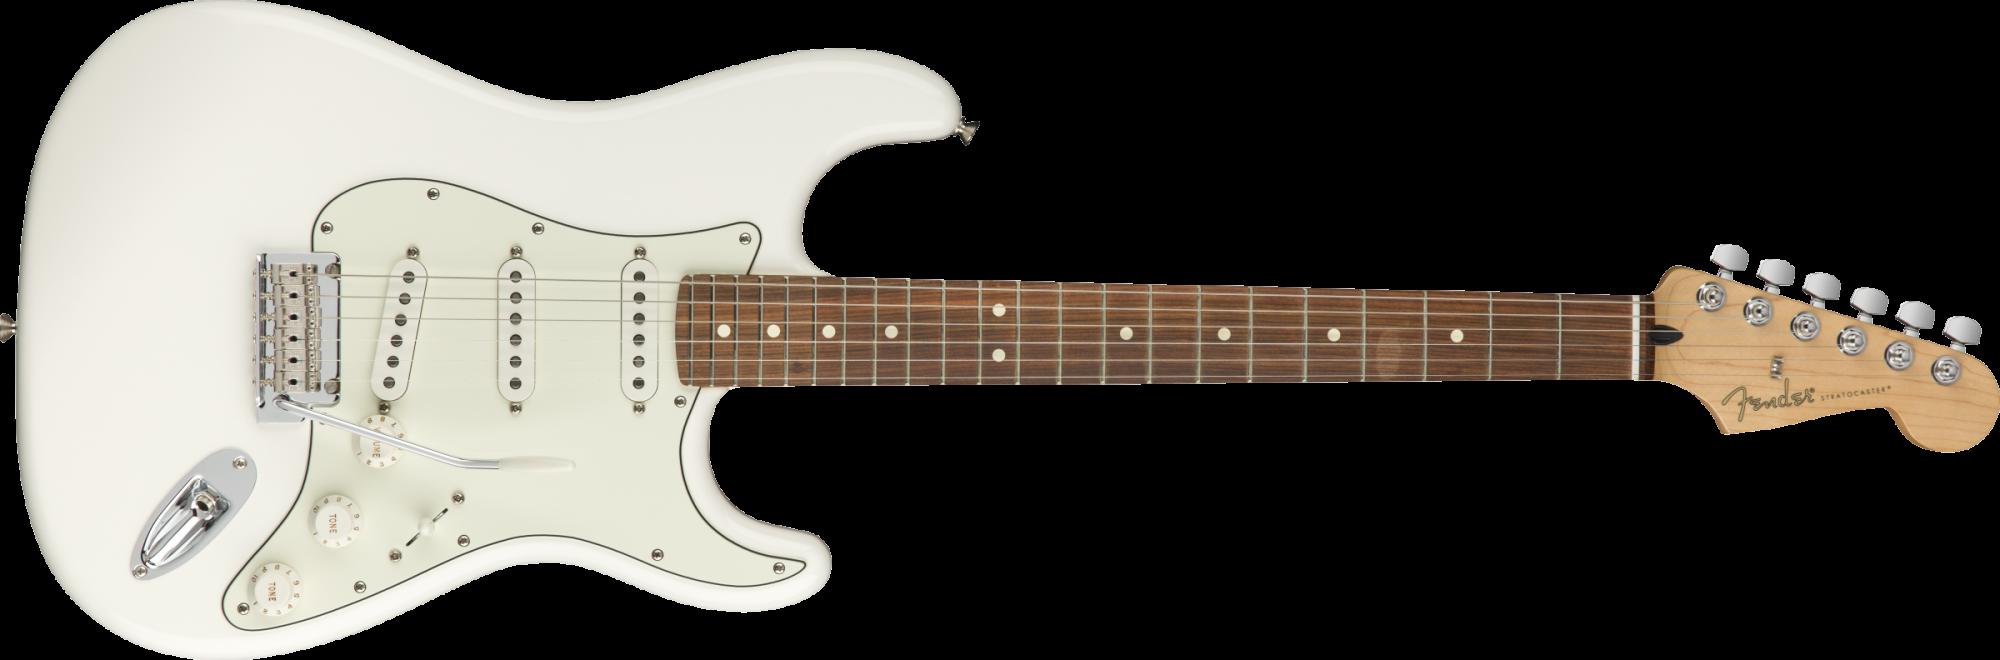 Fender Player Stratocaster Pau Ferro Neck